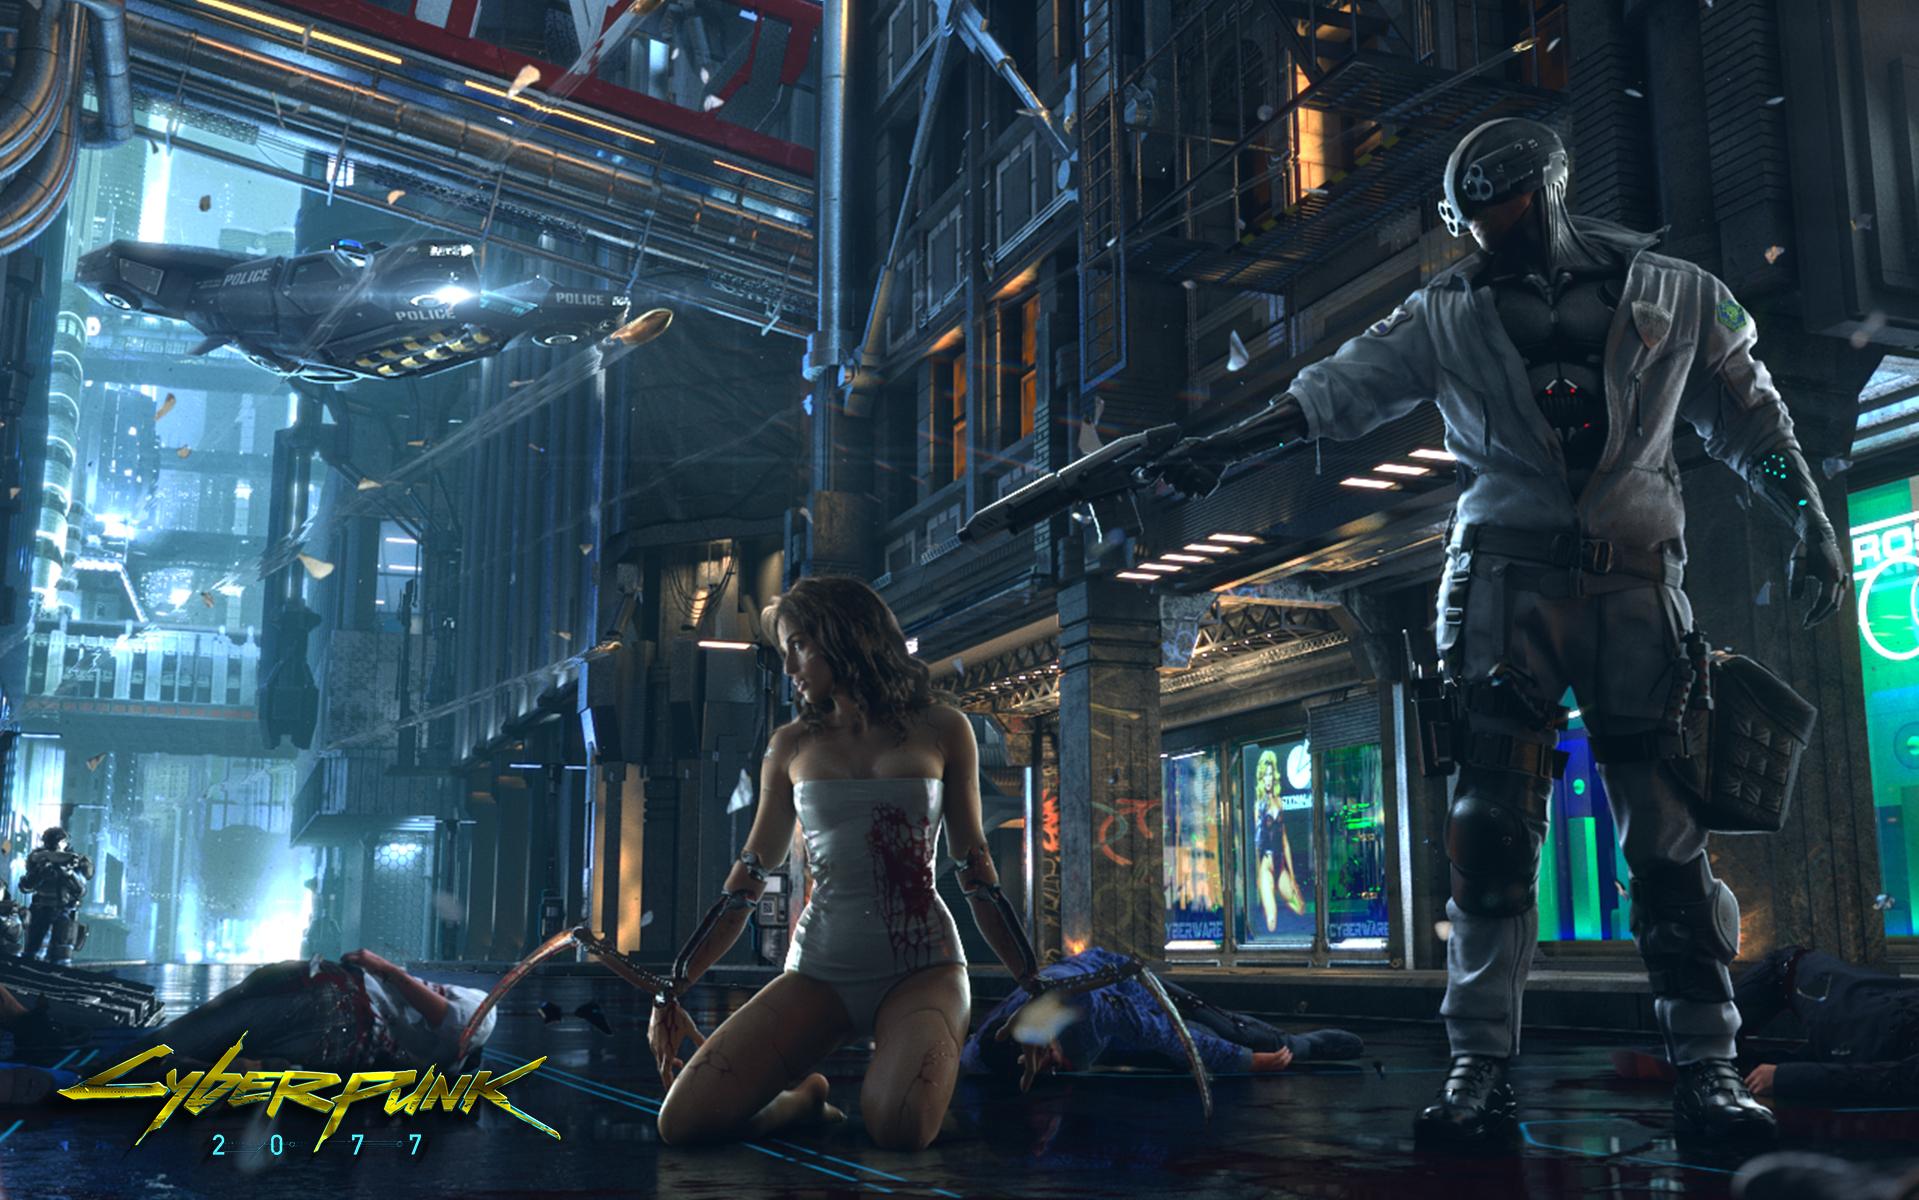 cyberpunk 2077 - photo #10